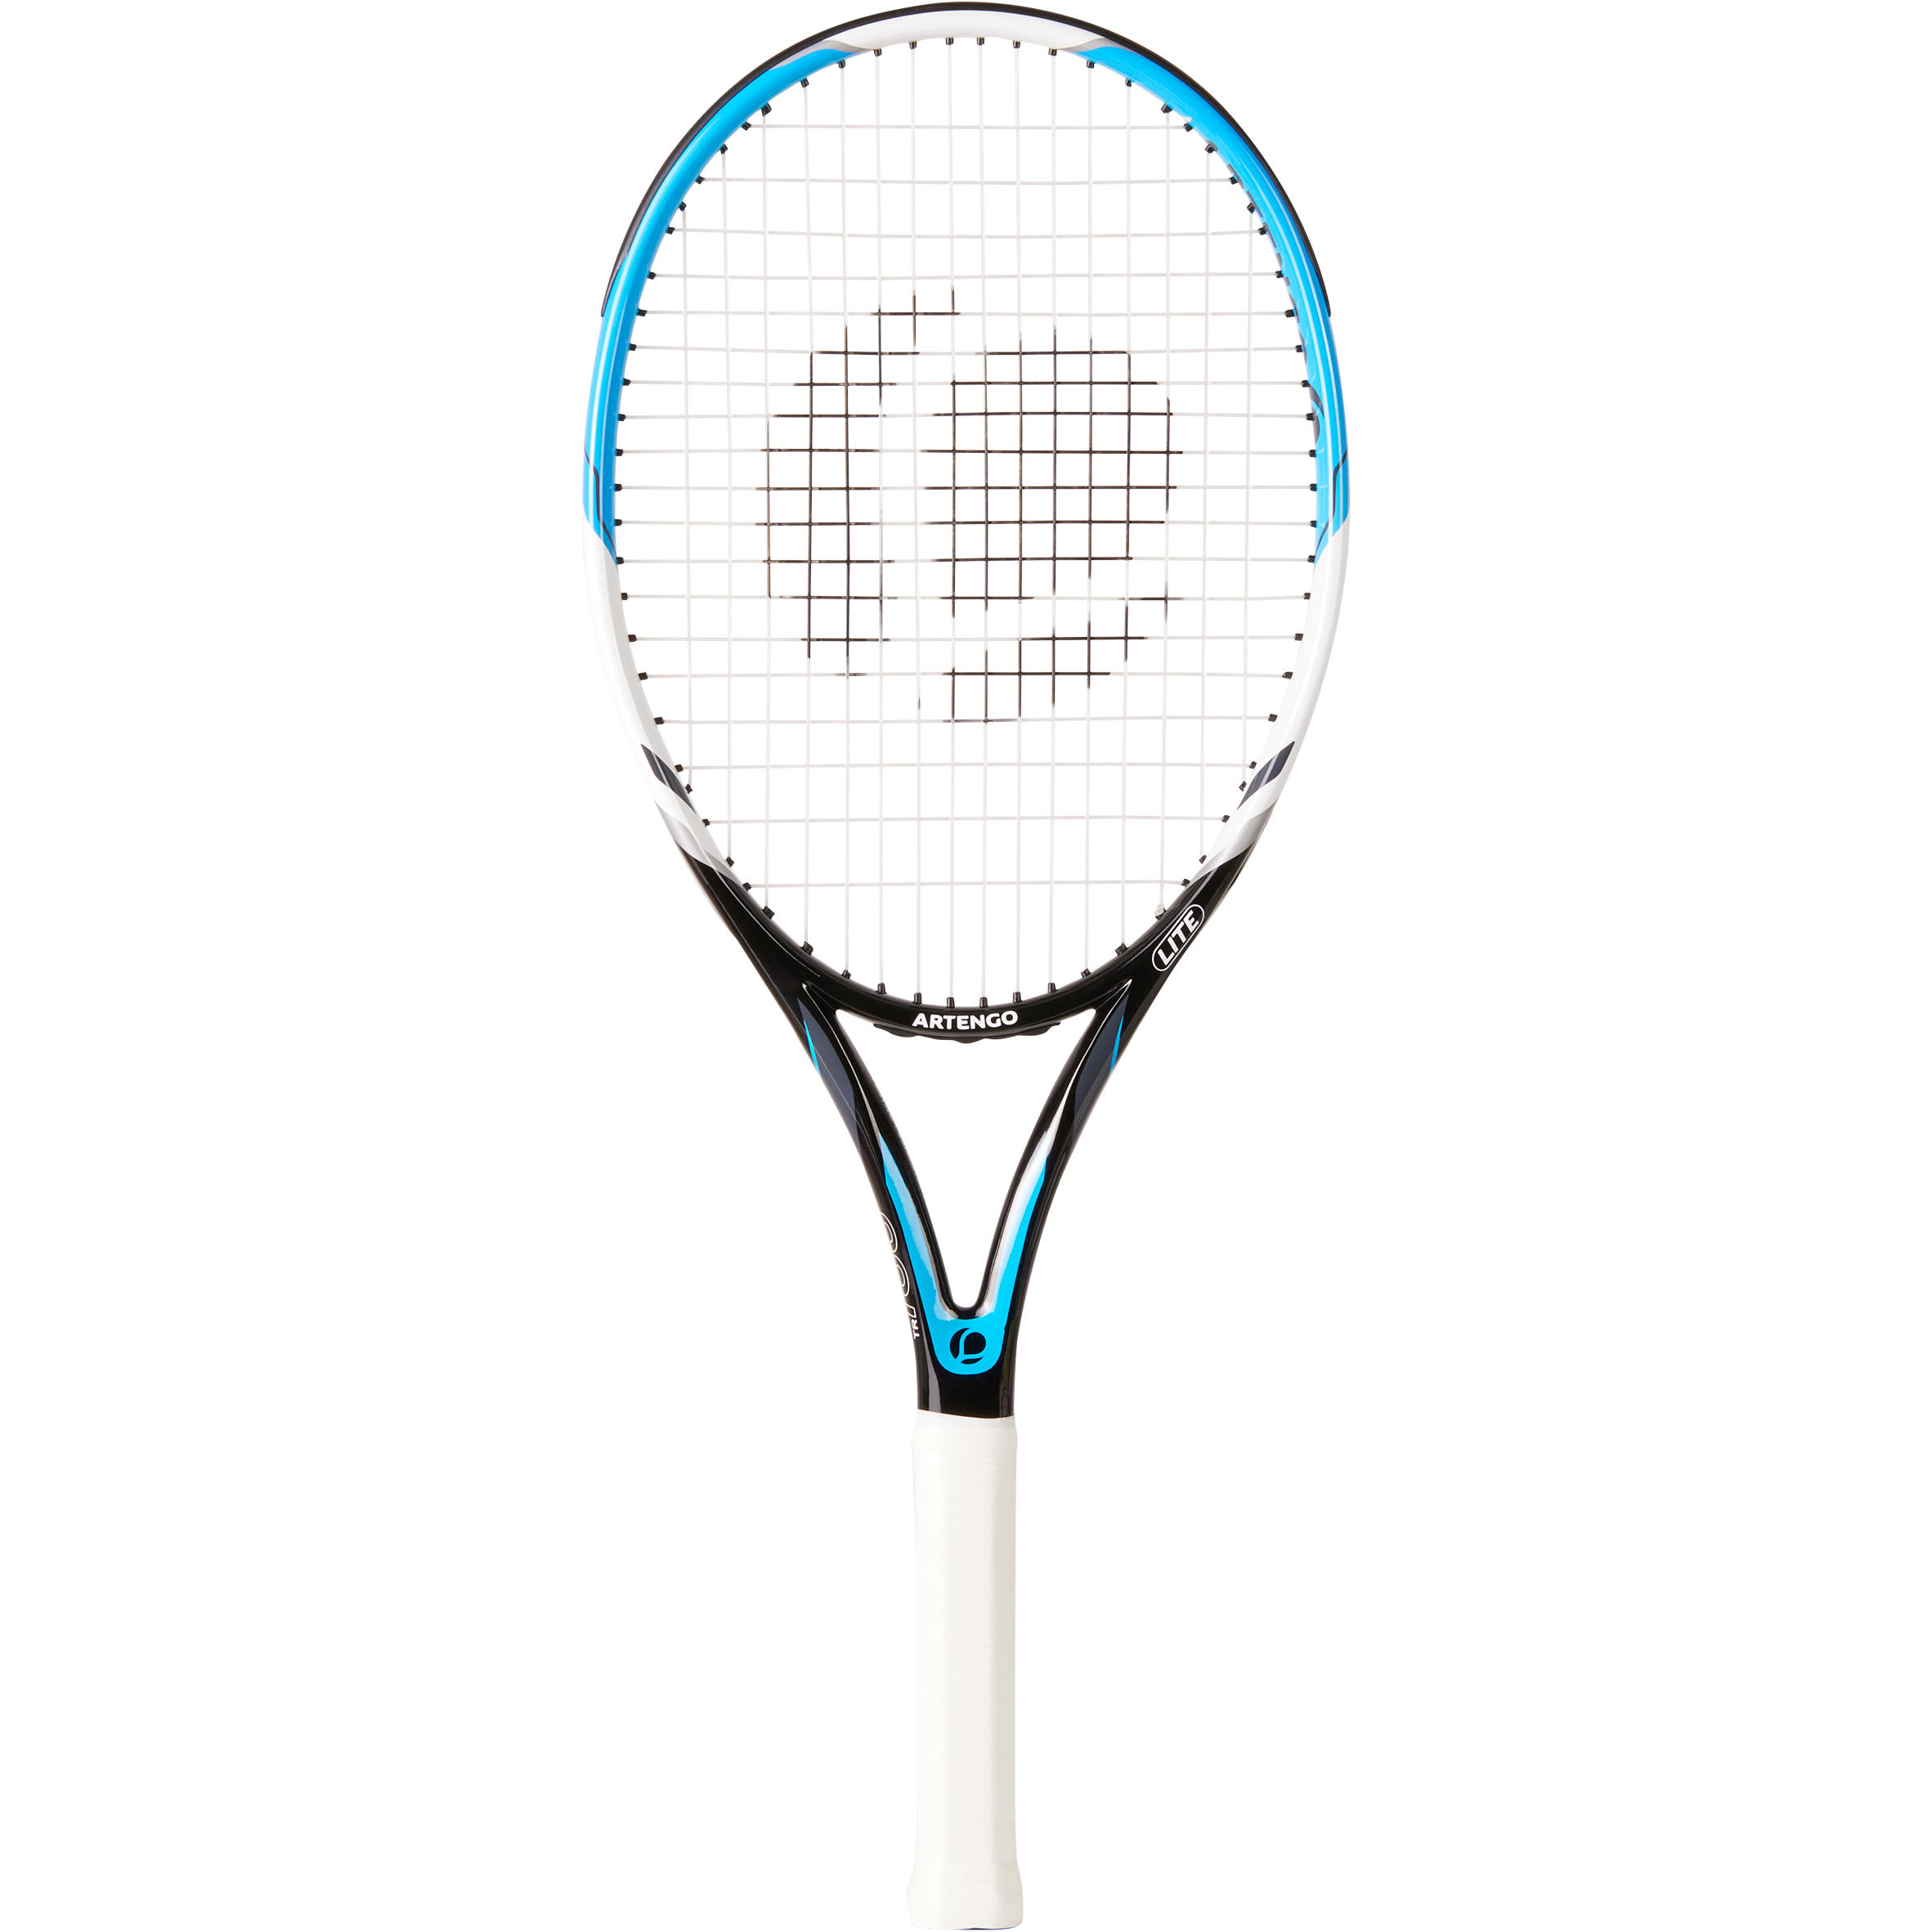 Artengo Tennisracket TR 160 Lite blauw